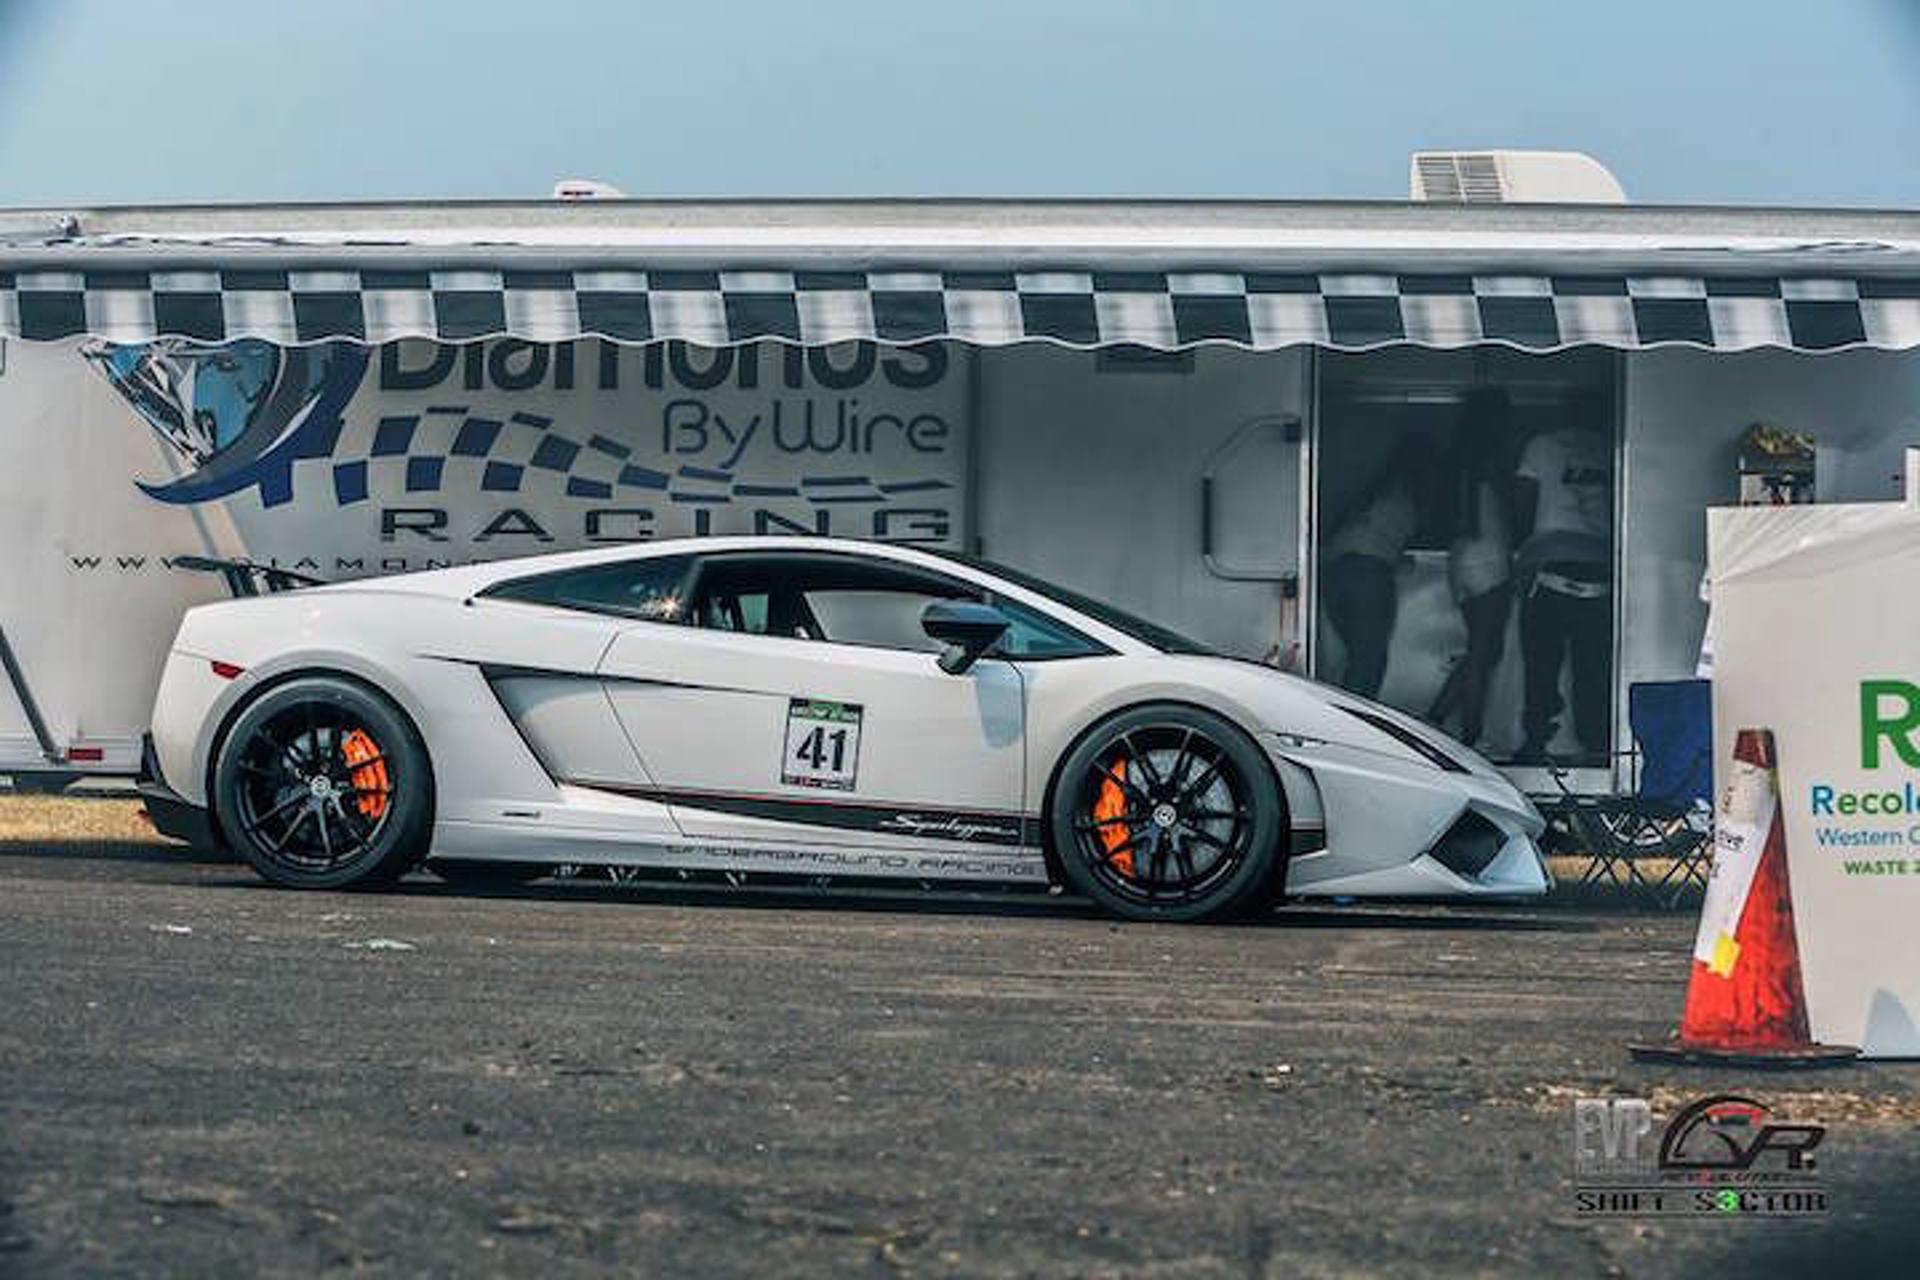 Watch This 2,000-HP Gallardo Become the World's Fastest Lamborghini…Again